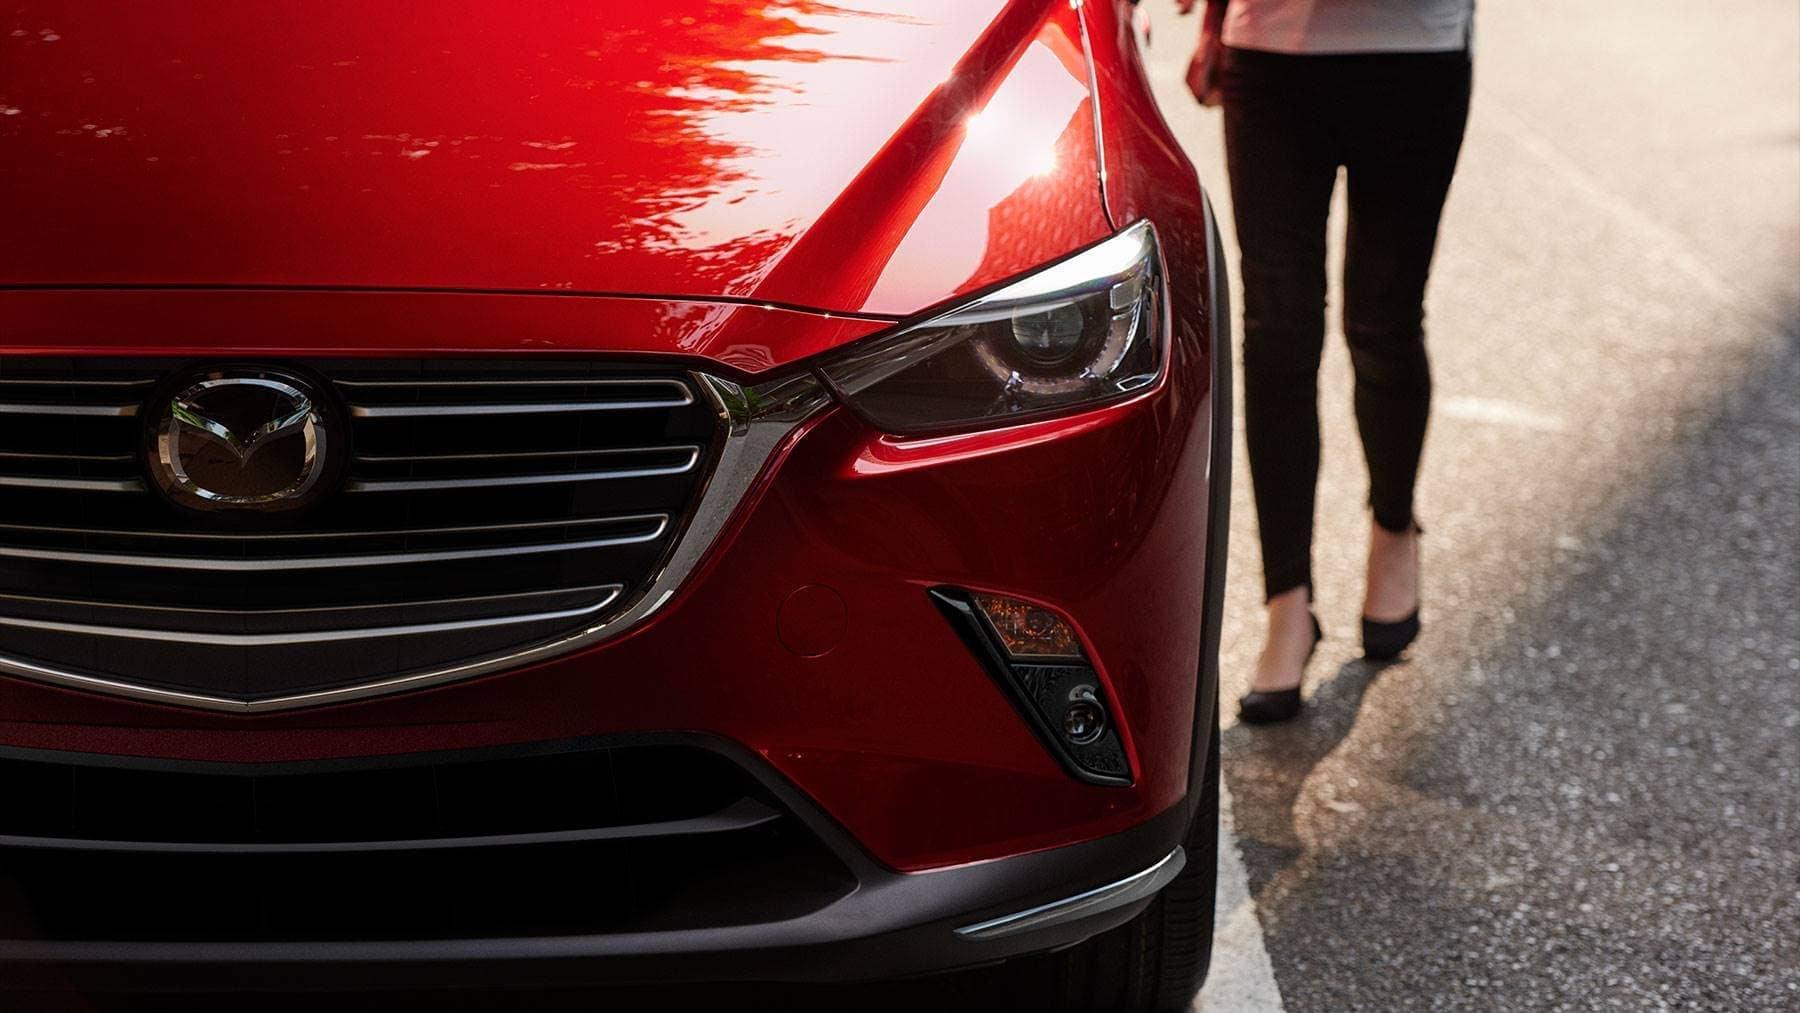 2019 Mazda CX-3 front exterior